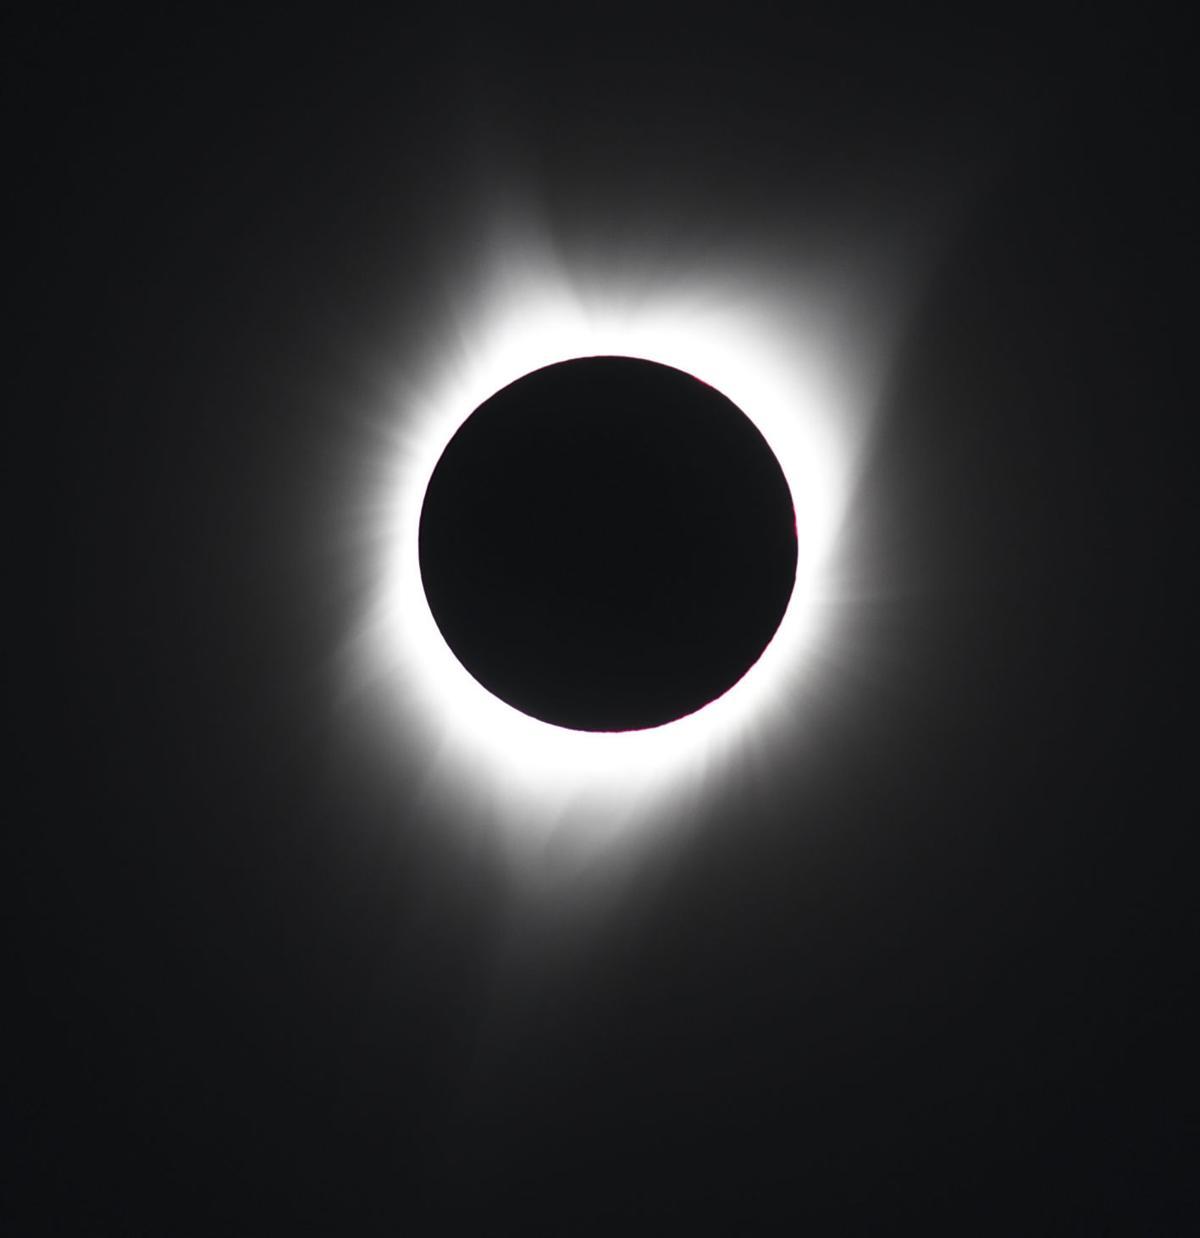 Solar Eclipse at Oregon State University (copy)